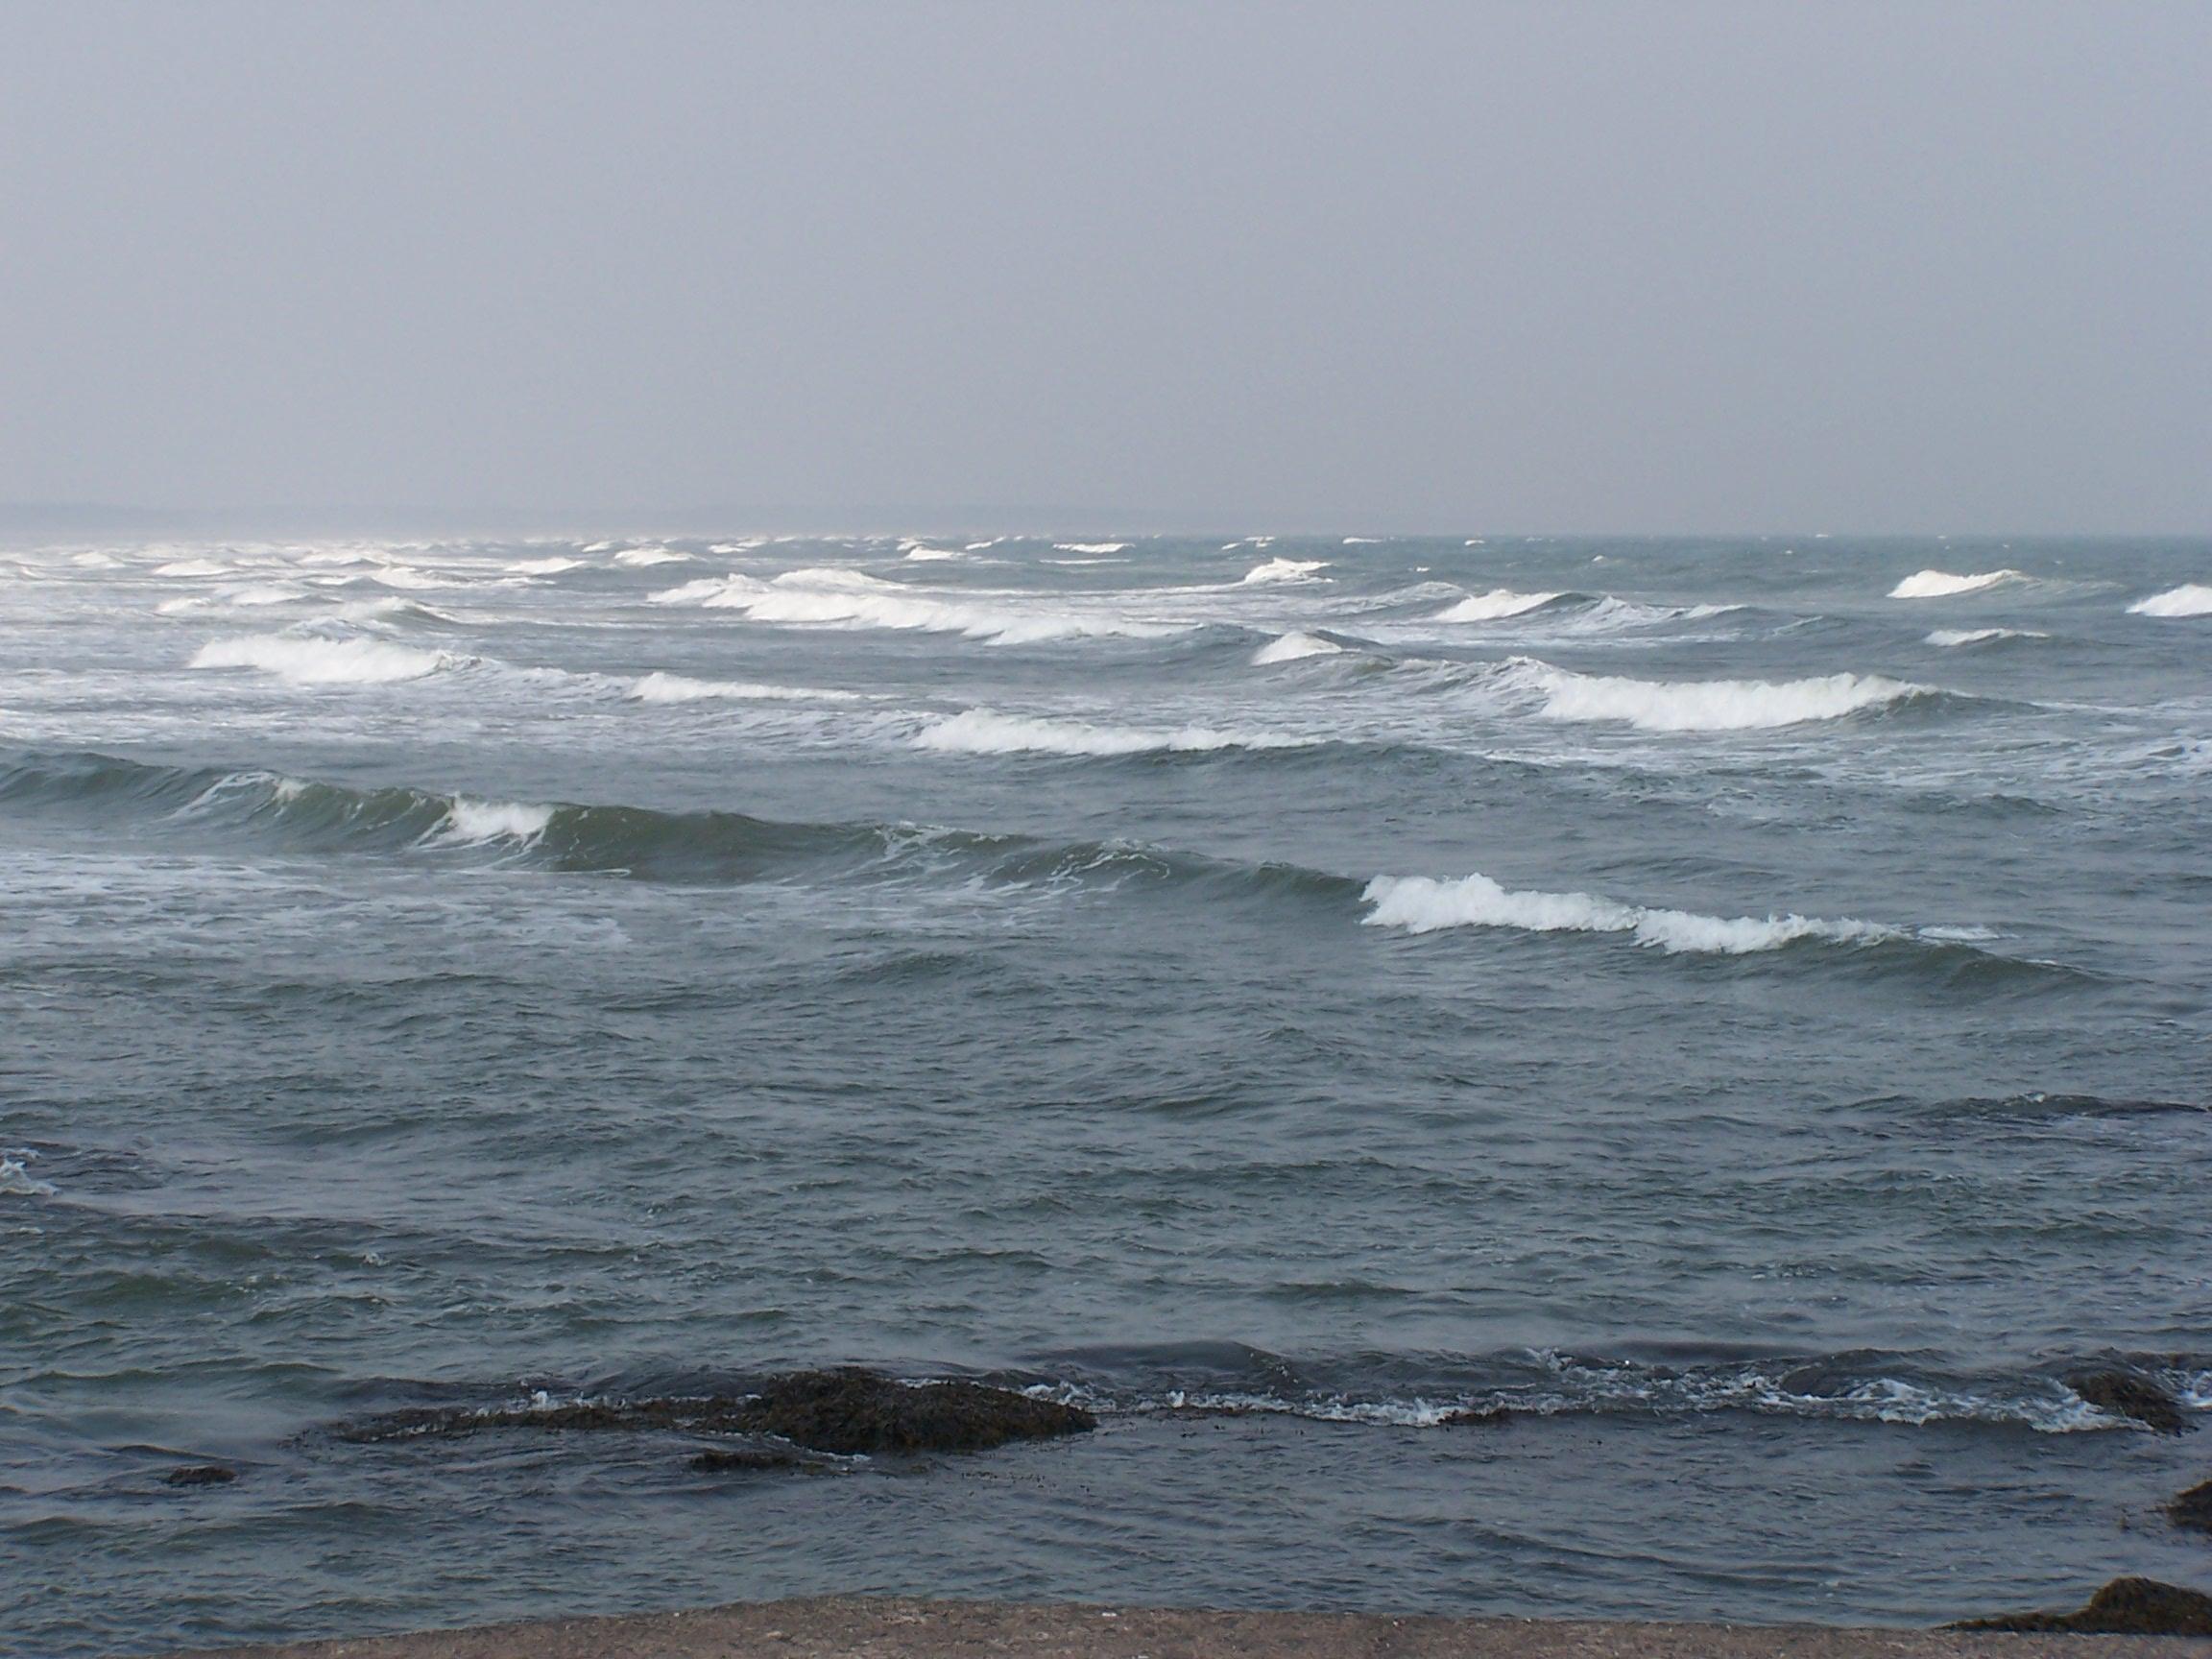 Http Jameswoodward Wordpress Com 2010 09 10 Sea 2